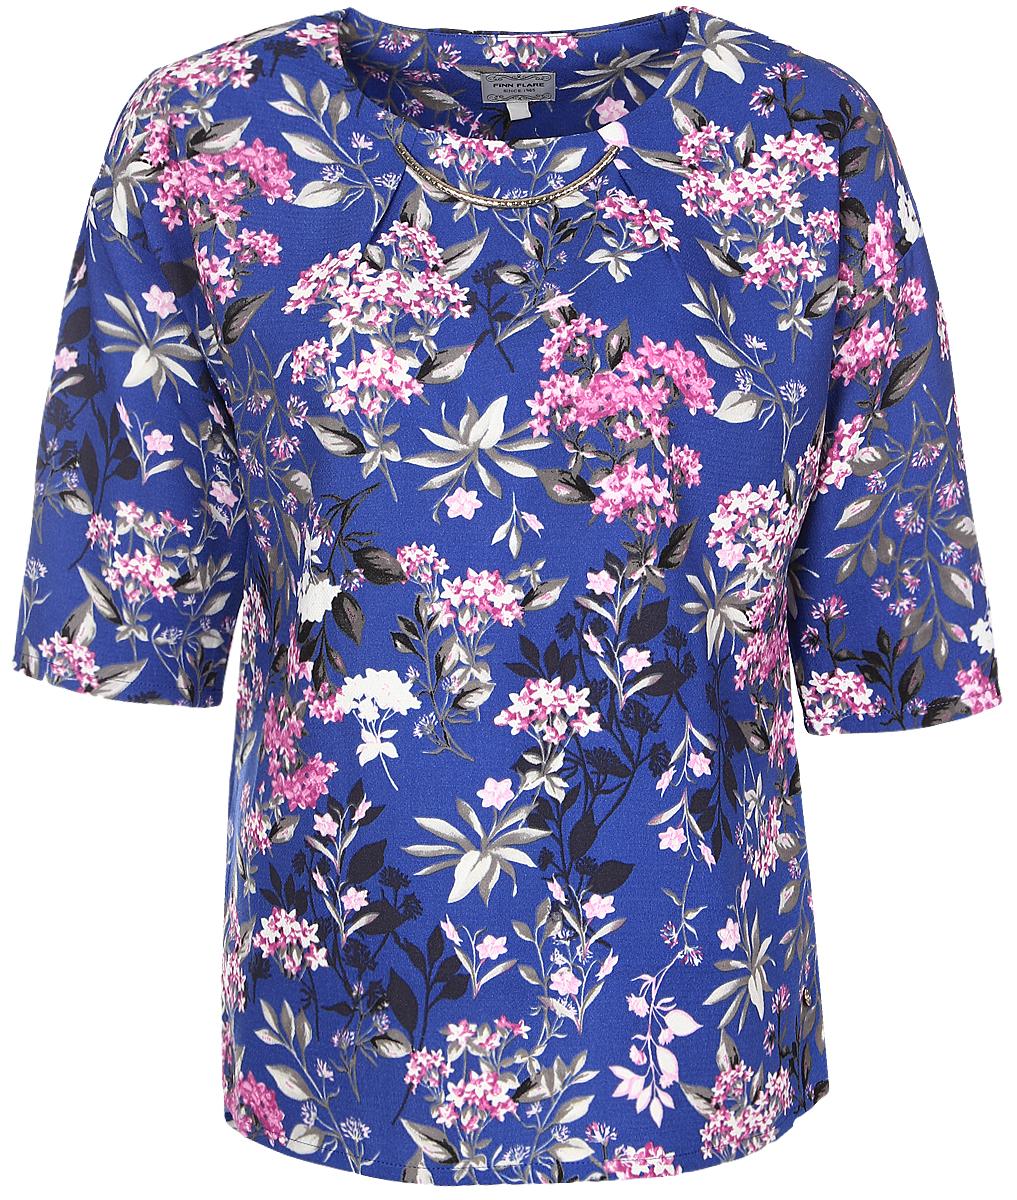 Блузка женская Finn Flare, цвет: синий. B17-11075_103. Размер M (46) блузка женская finn flare цвет лиловый синий бежевый s16 14085 814 размер m l 46 48